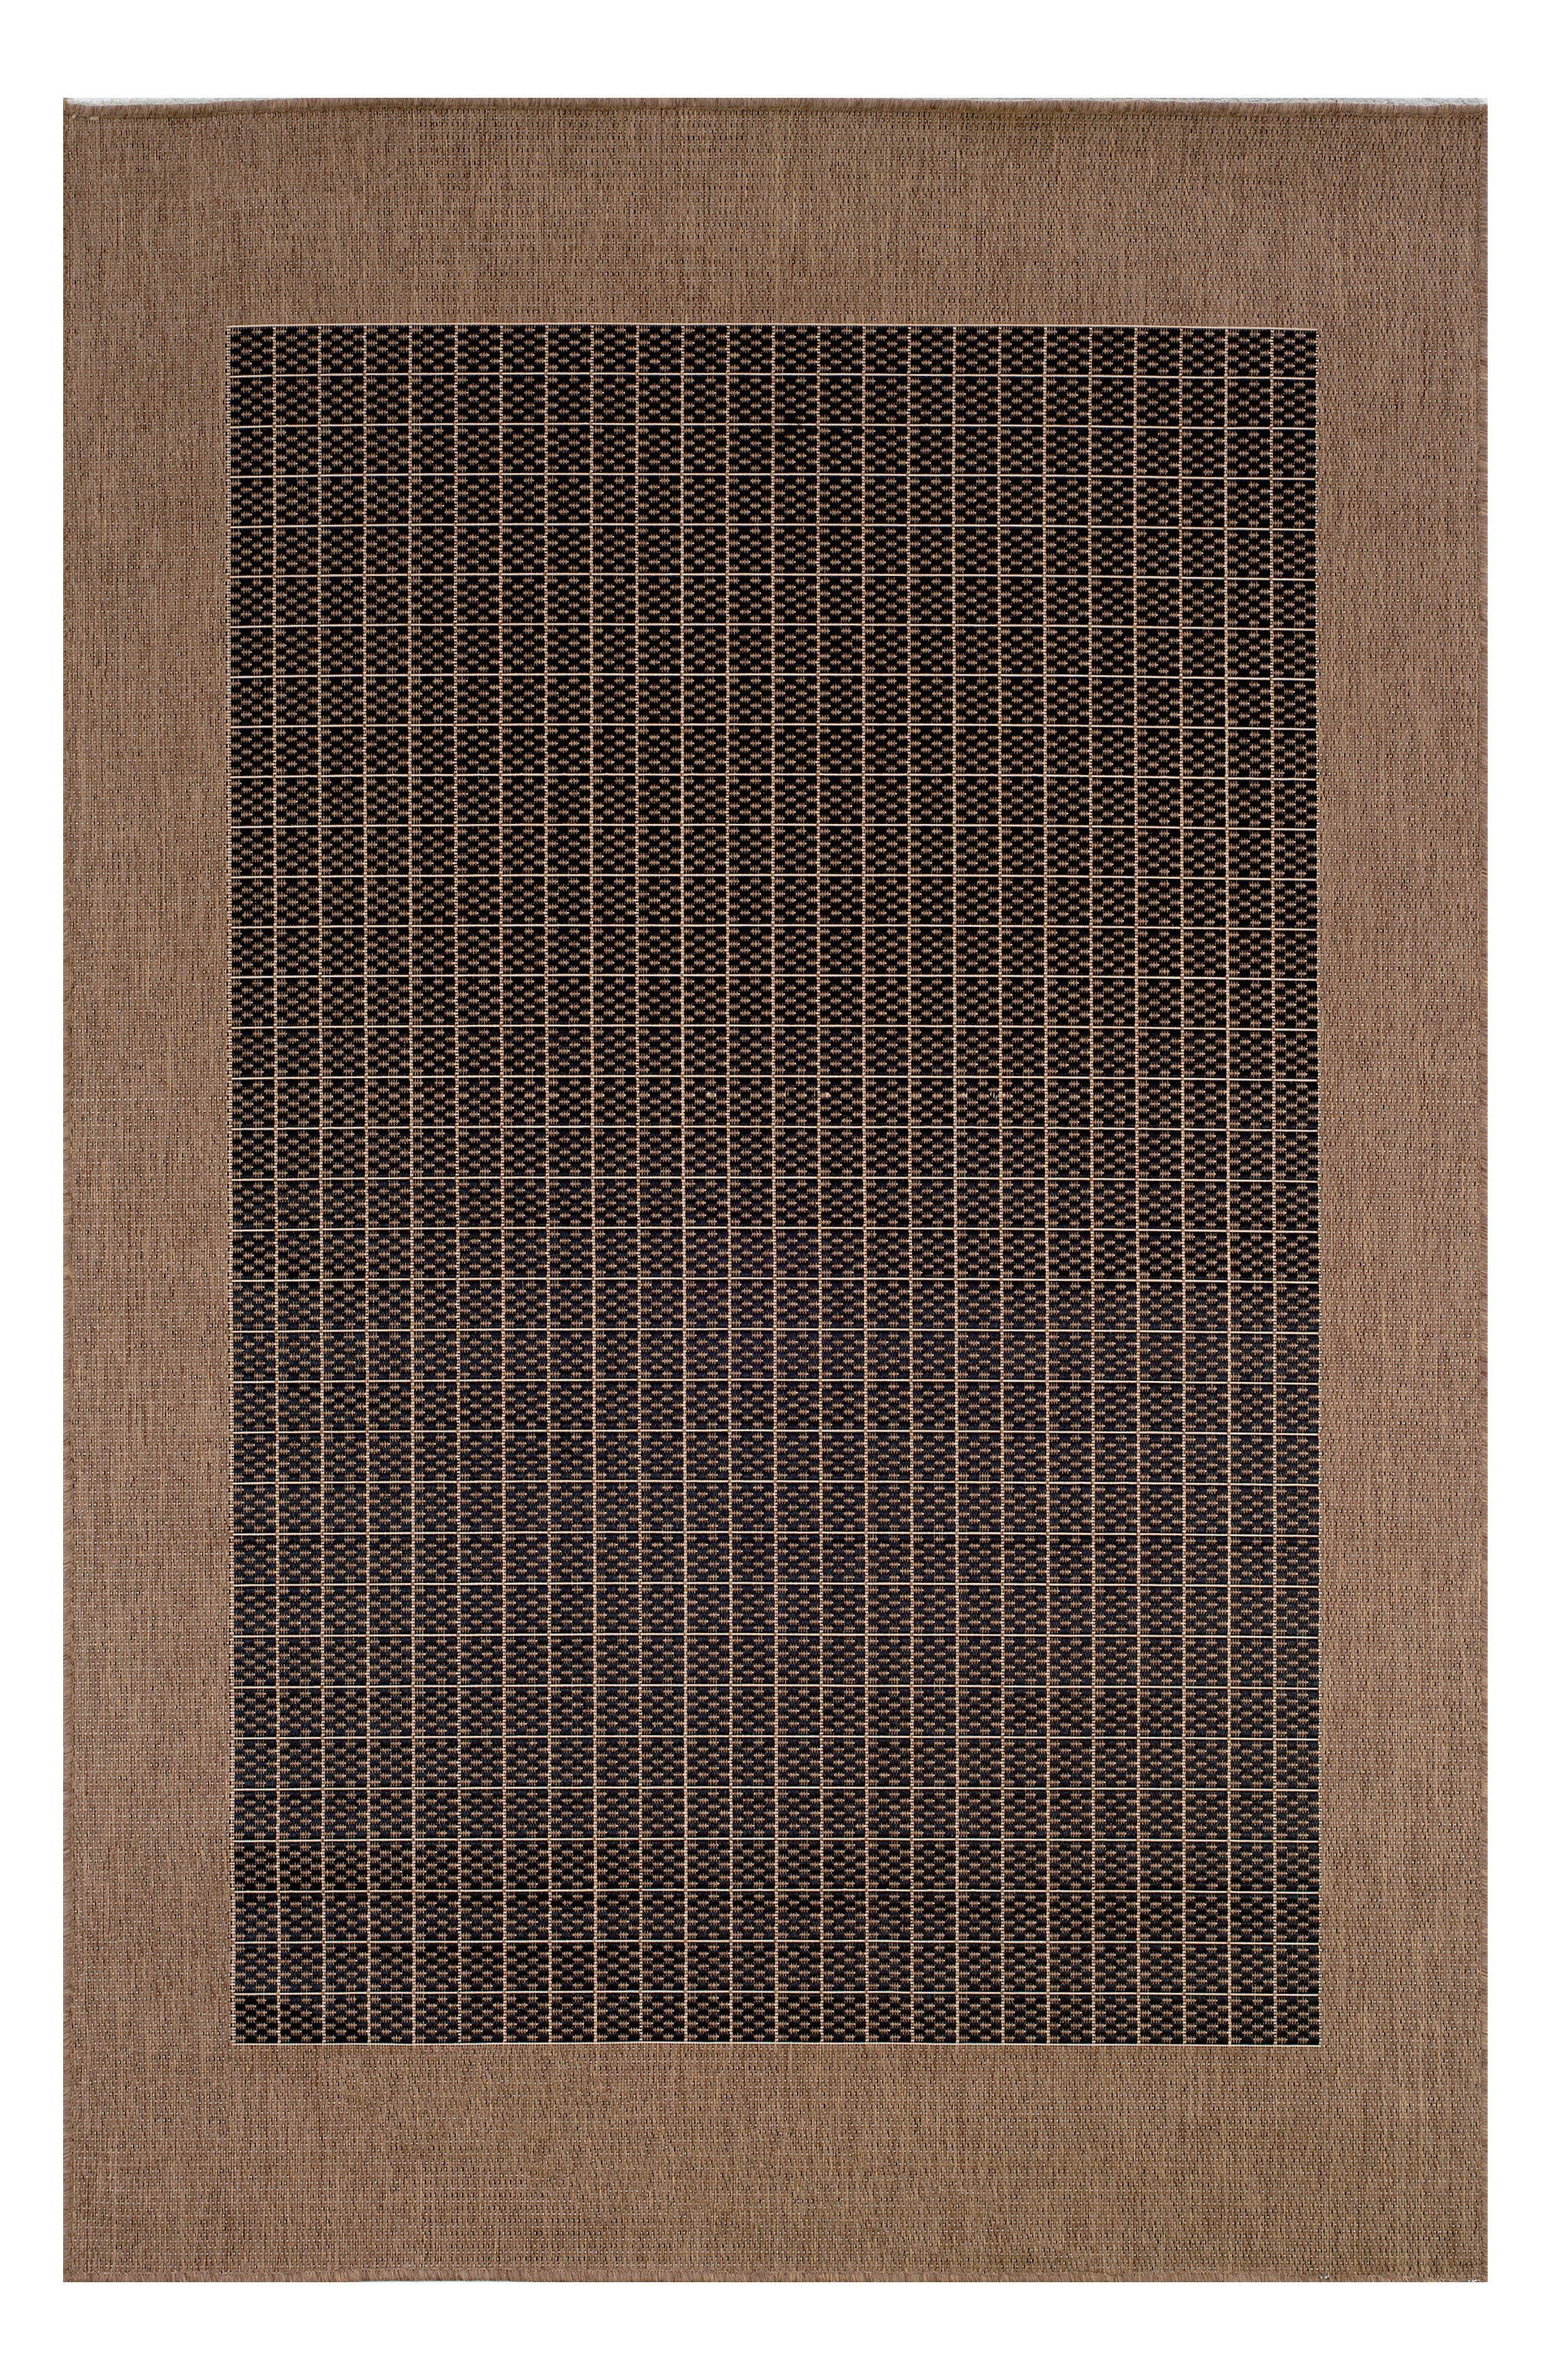 Checkered Field Indoor/Outdoor Rug,                         Main,                         color, Black/ Cocoa